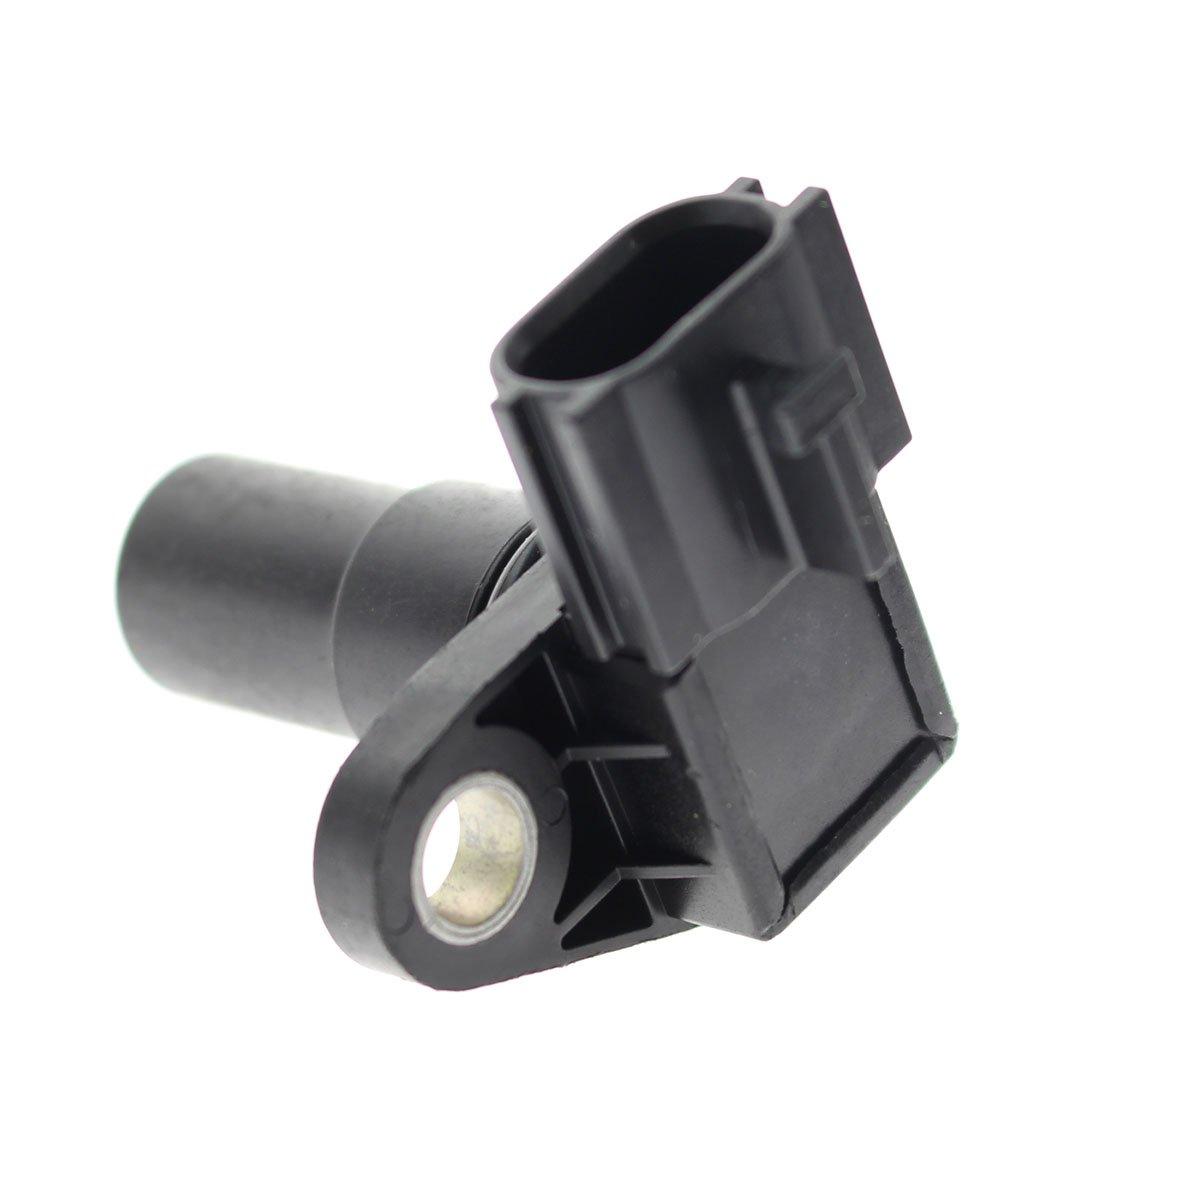 nissan tiida gearbox pump wiring diagramnissan tiida gearbox pump best wiring libraryamazon com autokay transmission speed sensor 31935 8e007 g4t07581 for